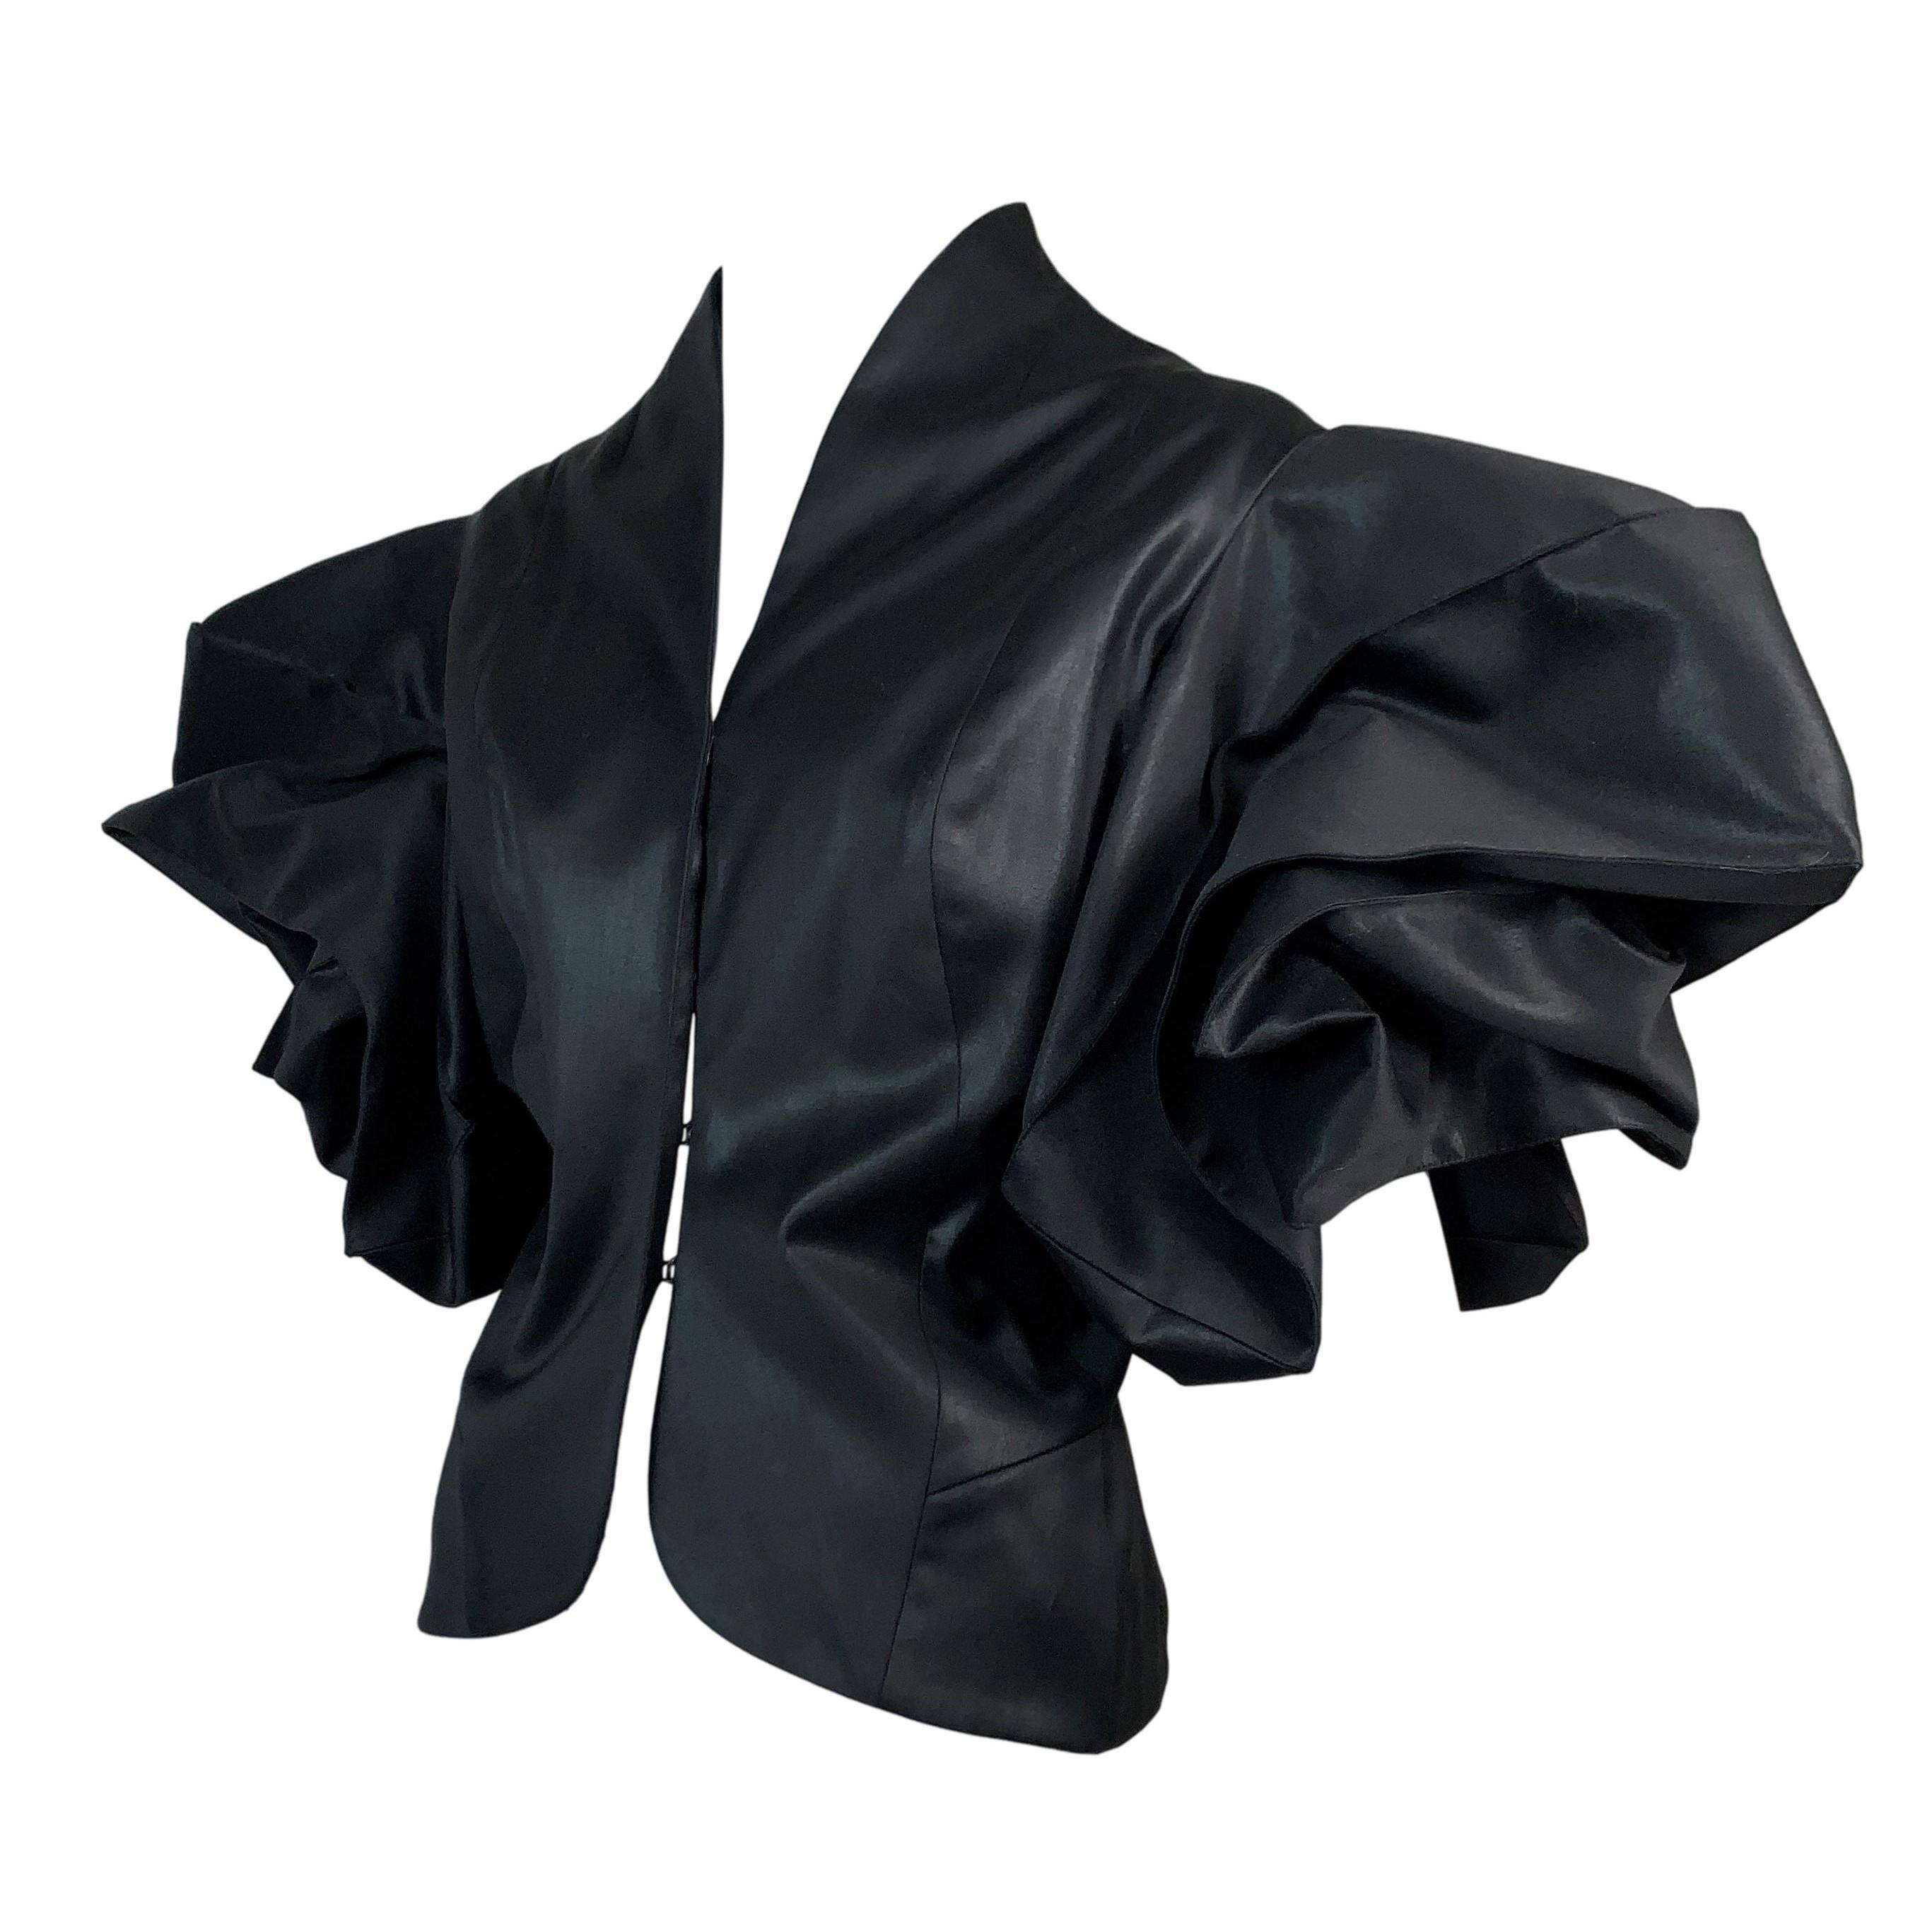 F/W 2003 Christian Dior John Galliano Glossy Black Kimono Jacket Top